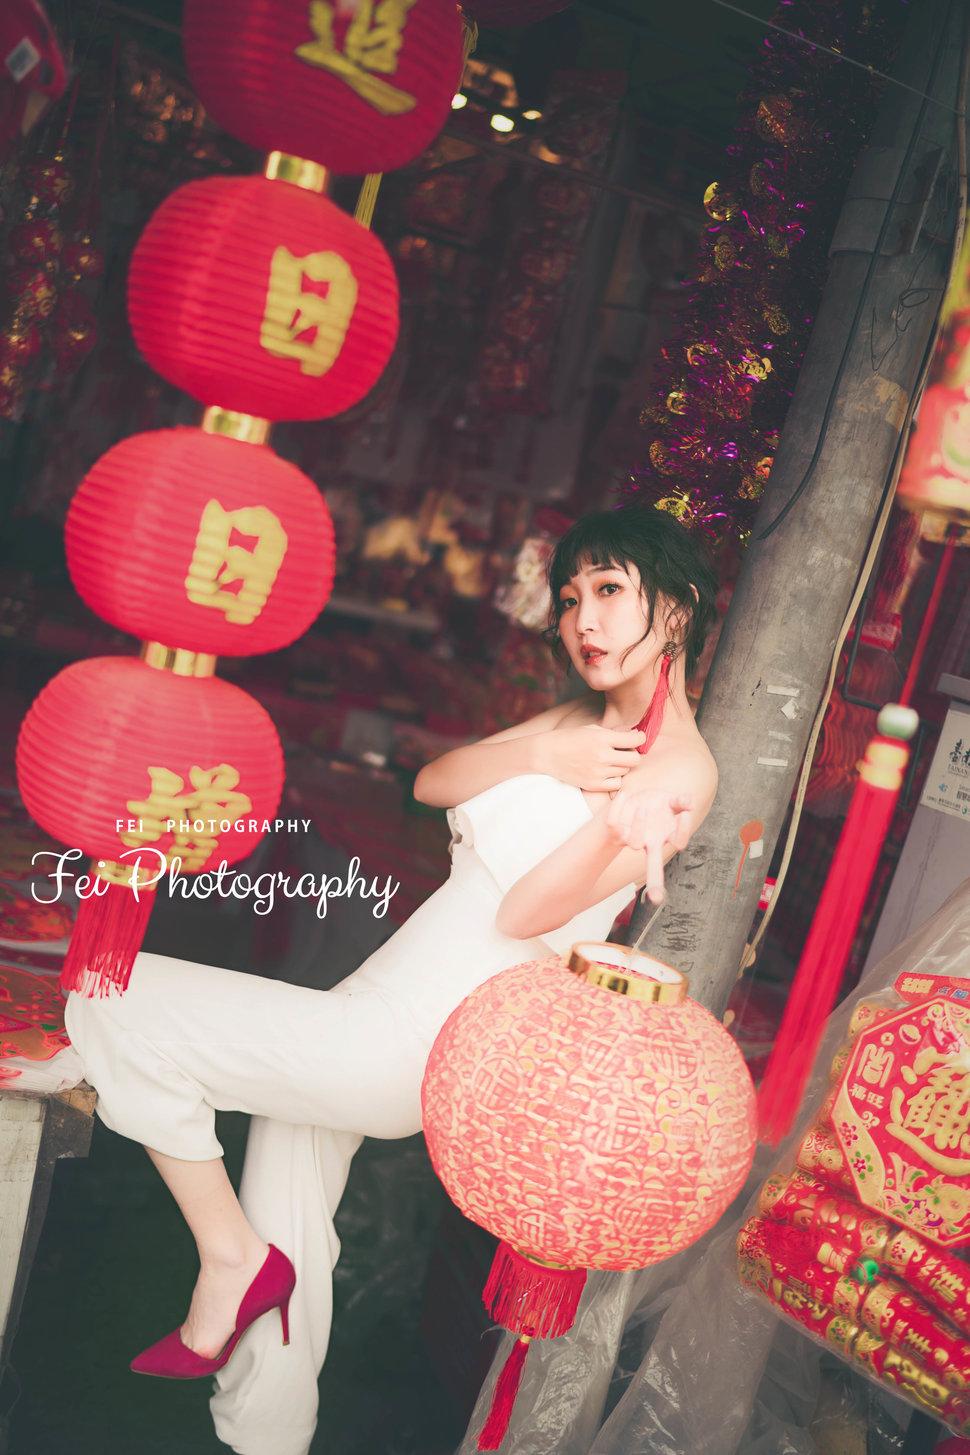 5 - 飛妃 Photography/女攝影師《結婚吧》